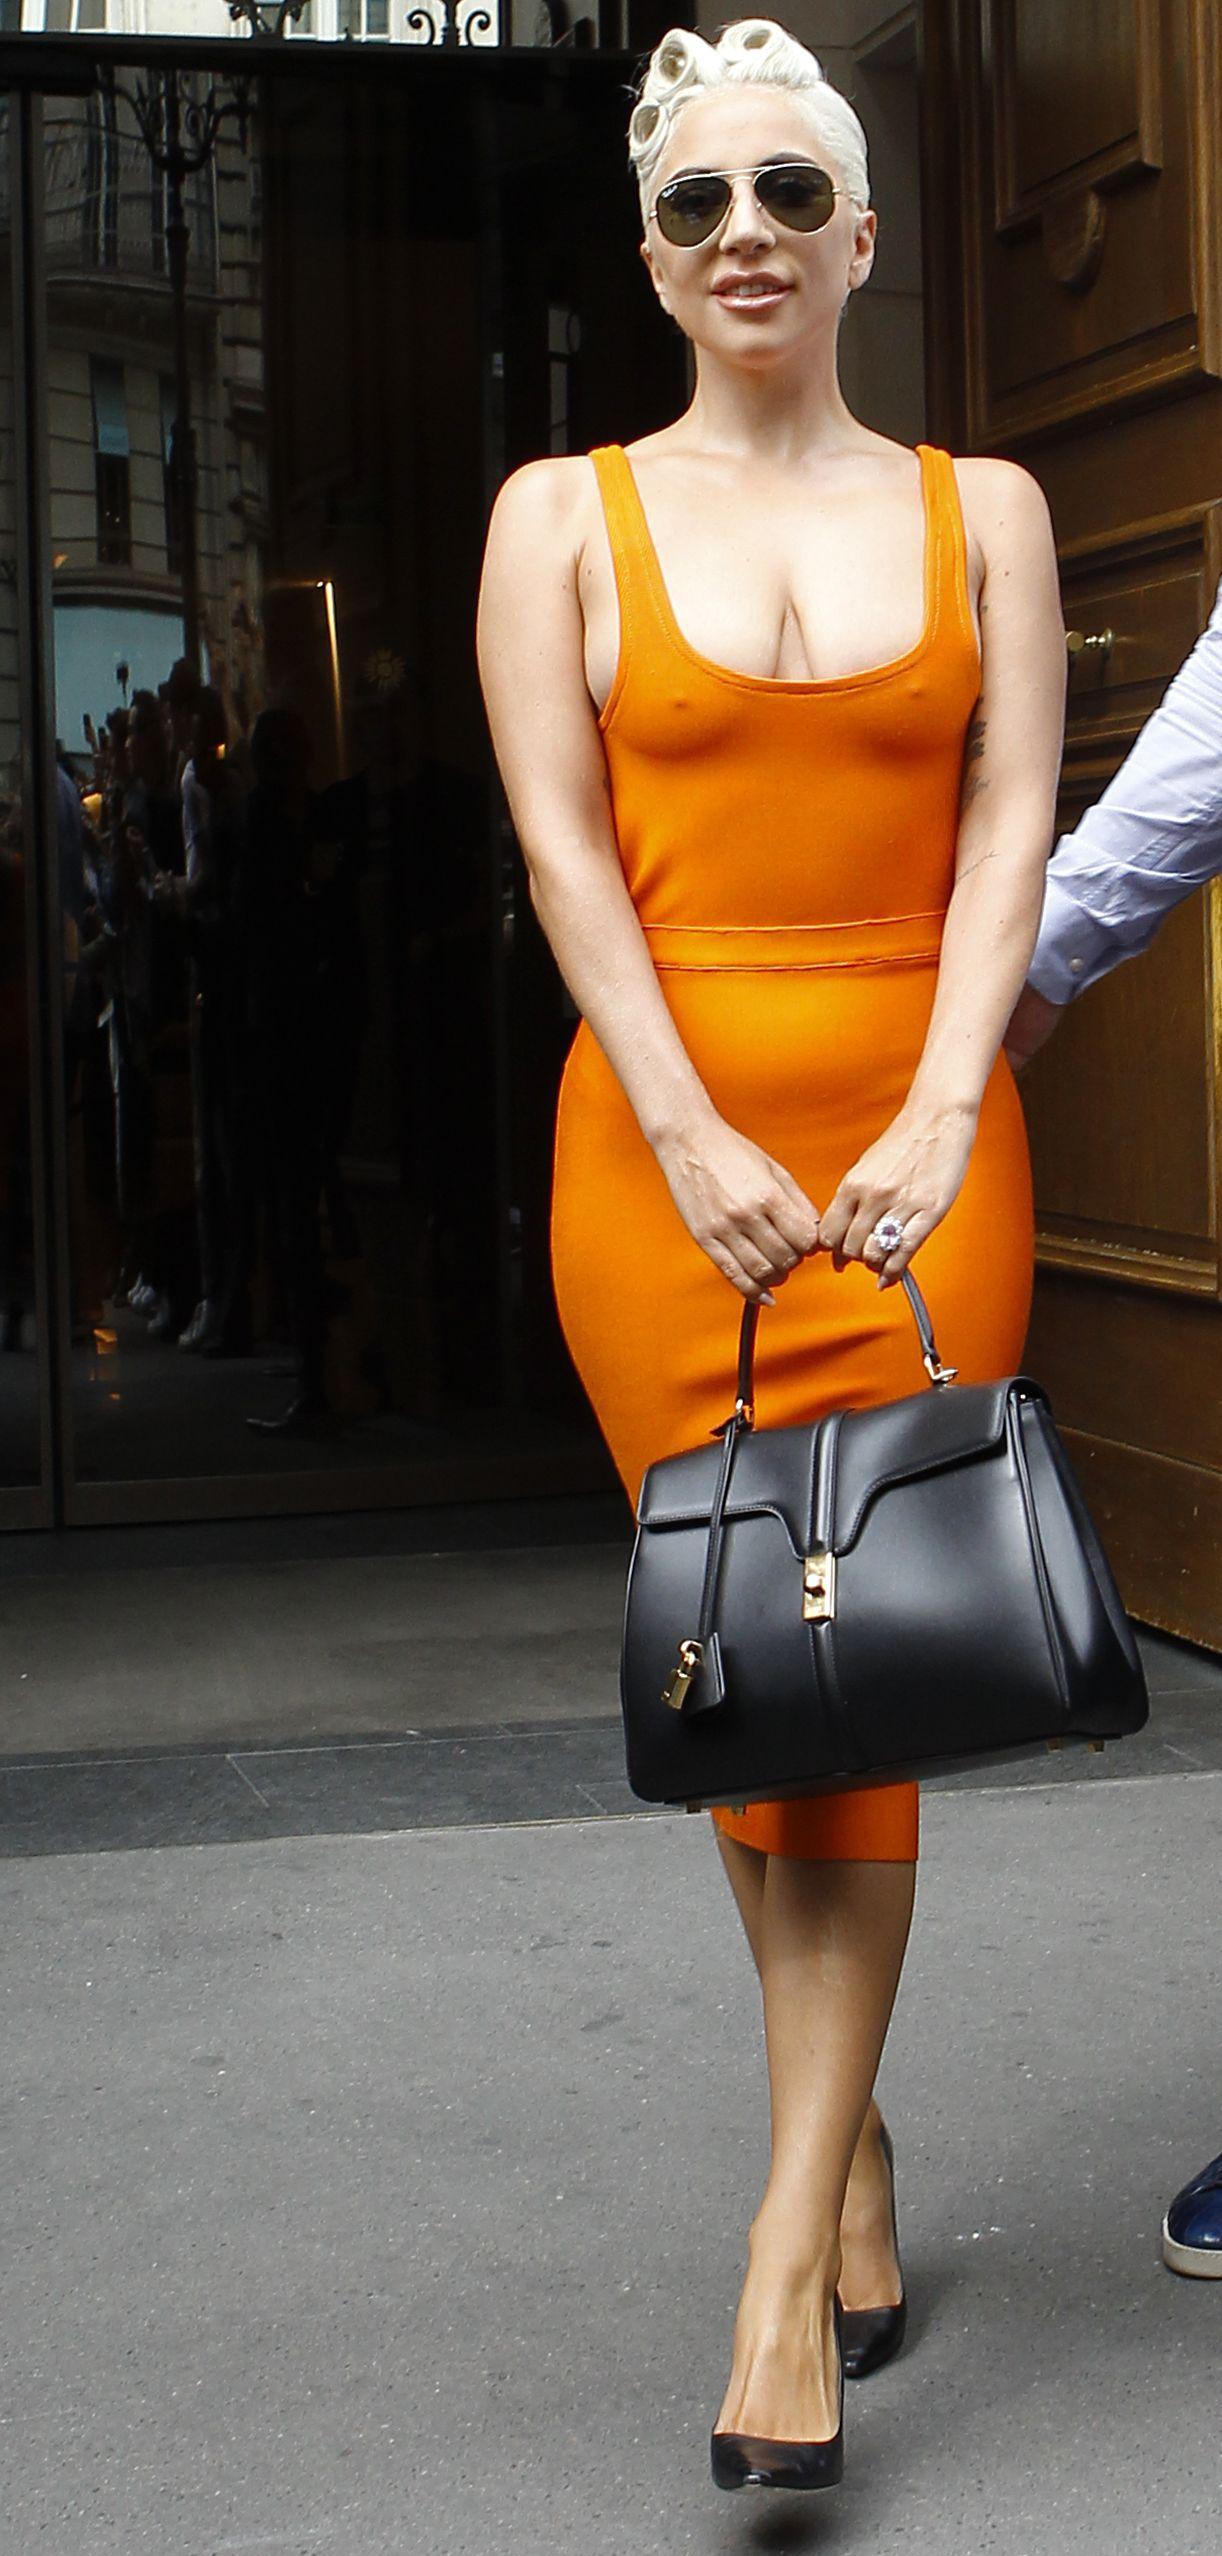 Lady Gaga was spotted last week in Paris carrying a handbag designed by Hedi Slimane for Celine